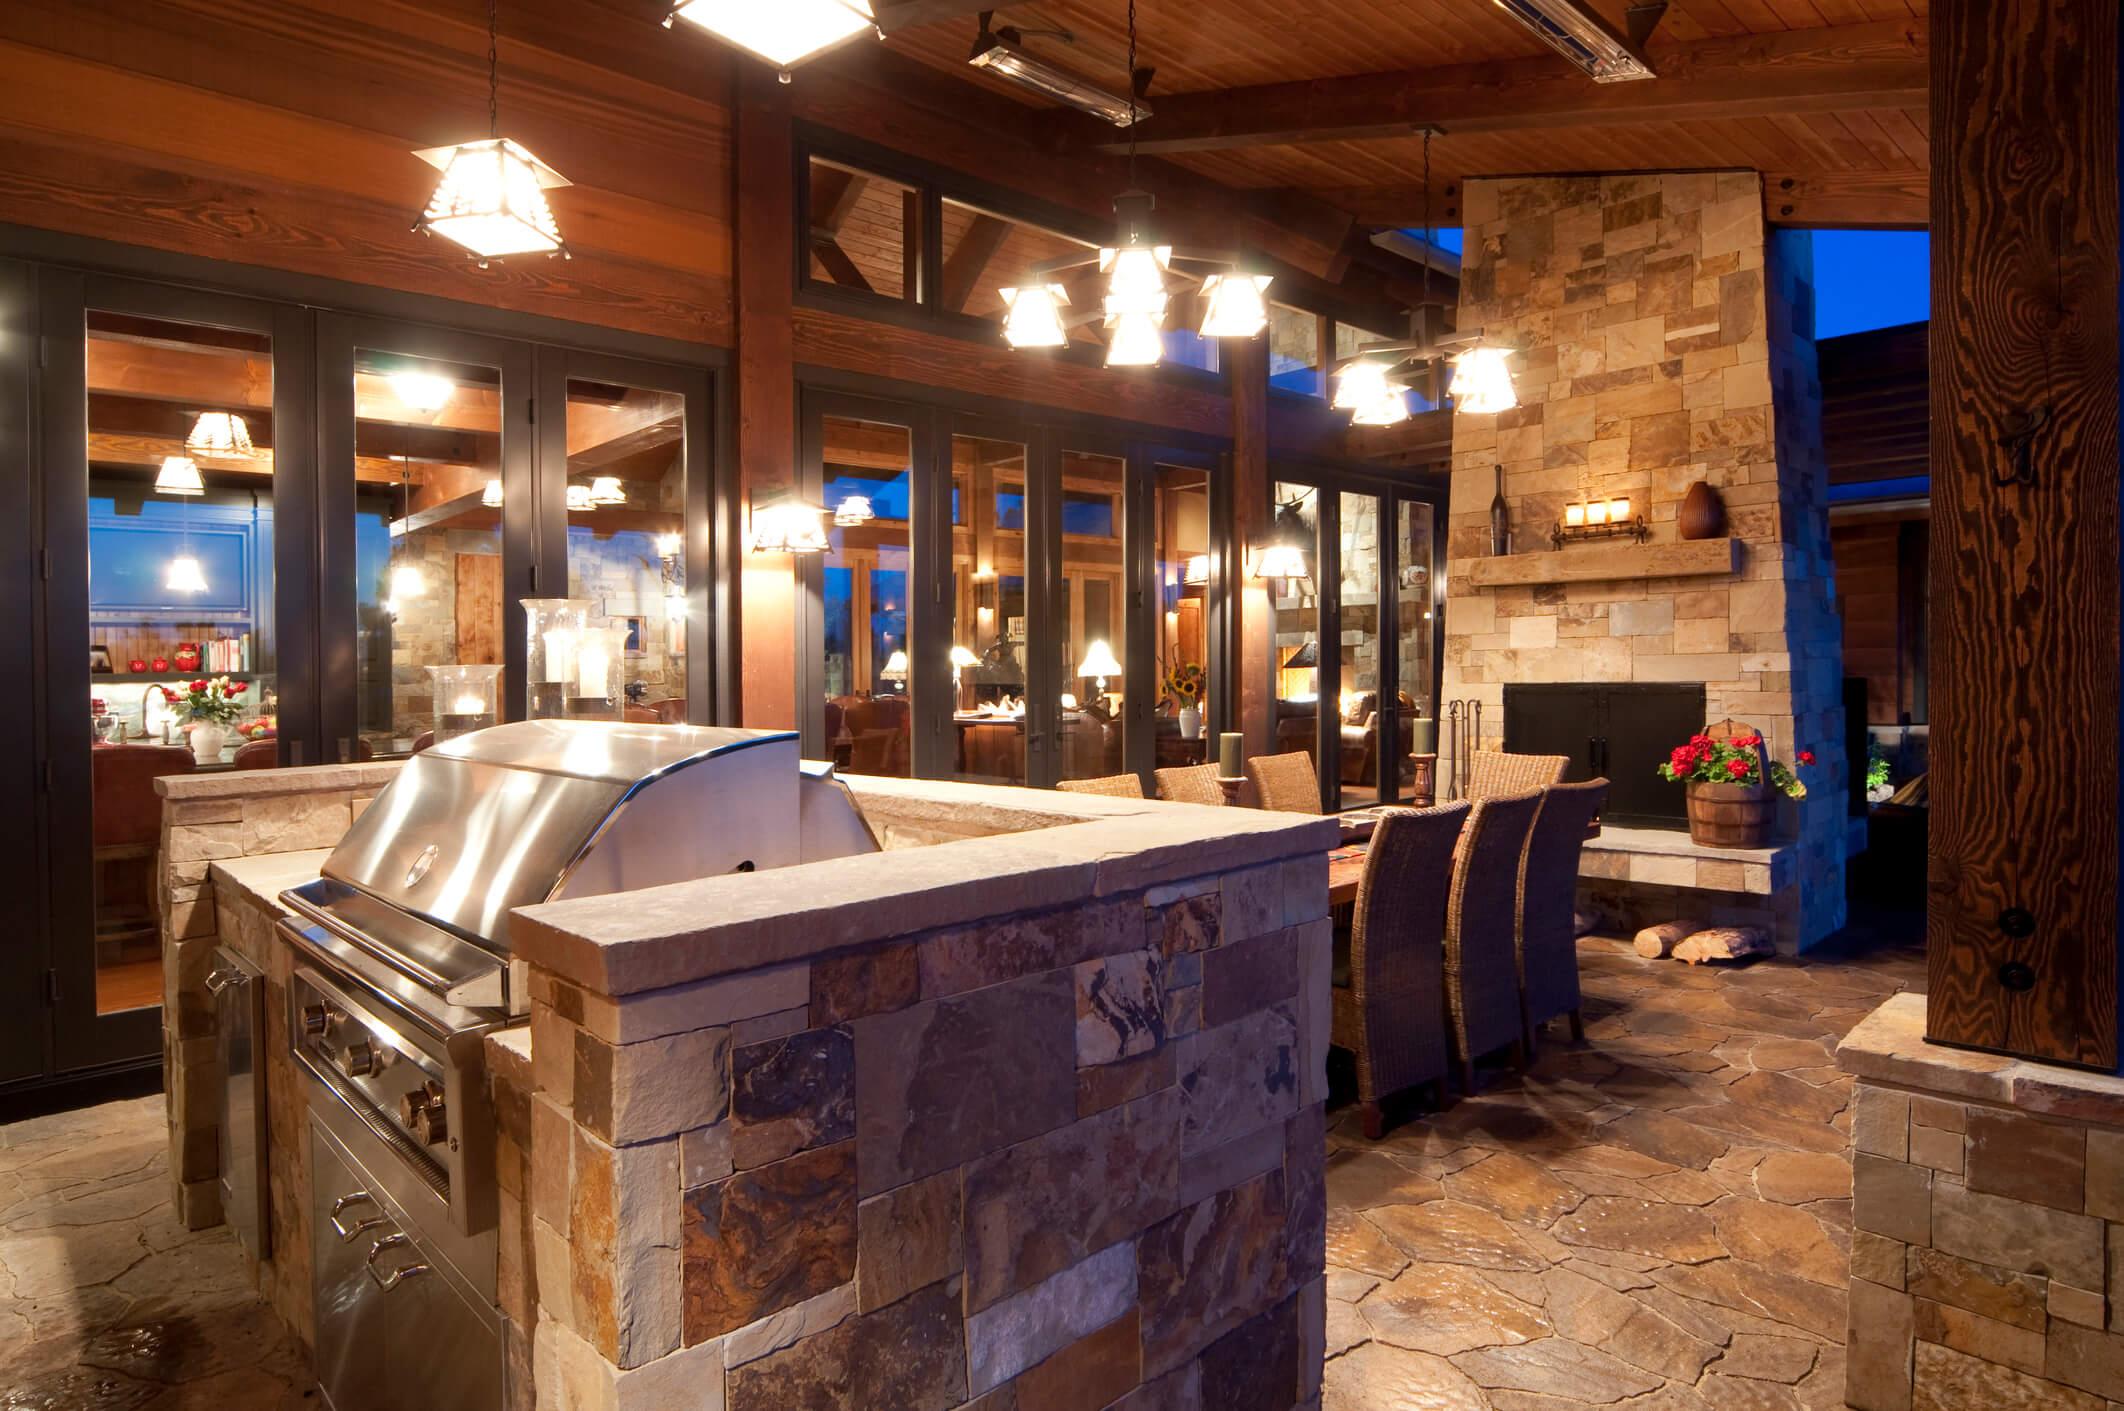 Deck Lighting Ideas 21 Inspiring Ideas For Your Decking Lights Better Homes And Gardens